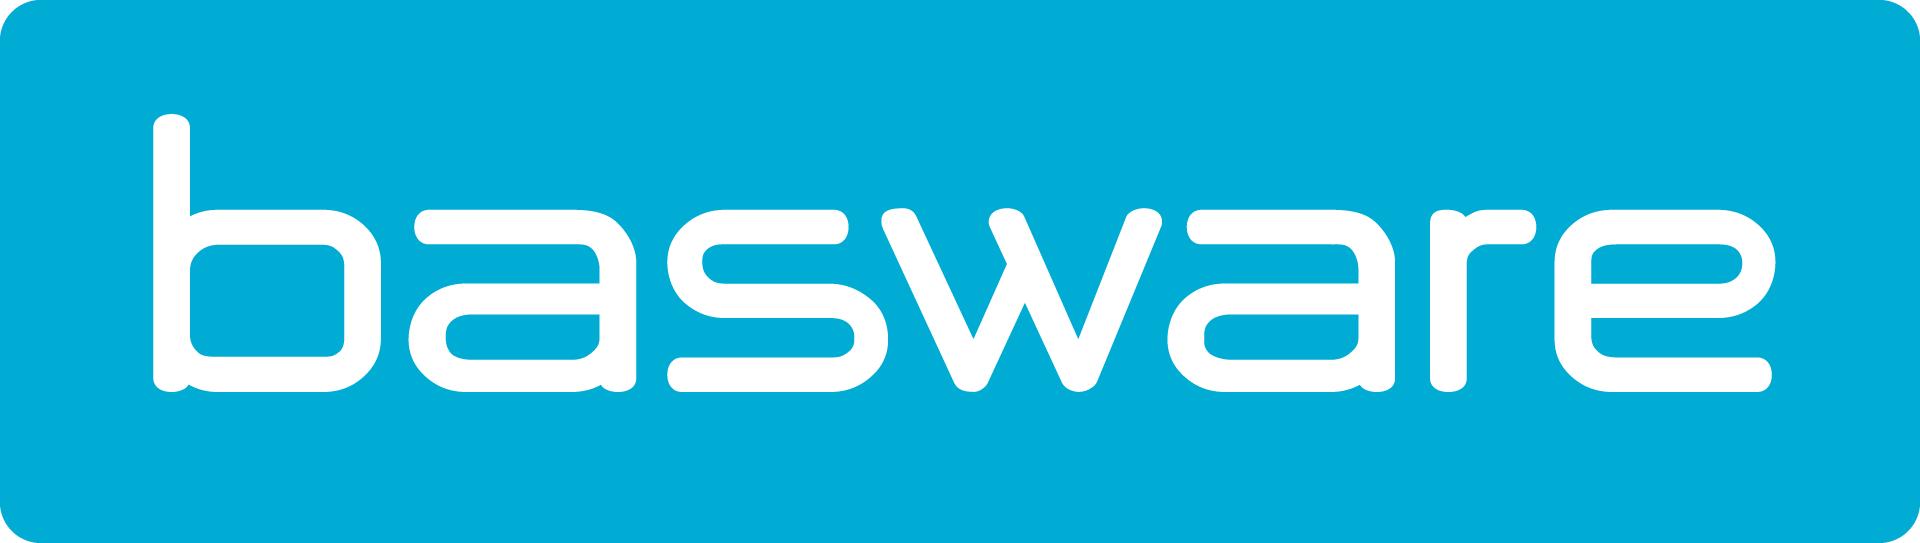 Basware-Logo.png